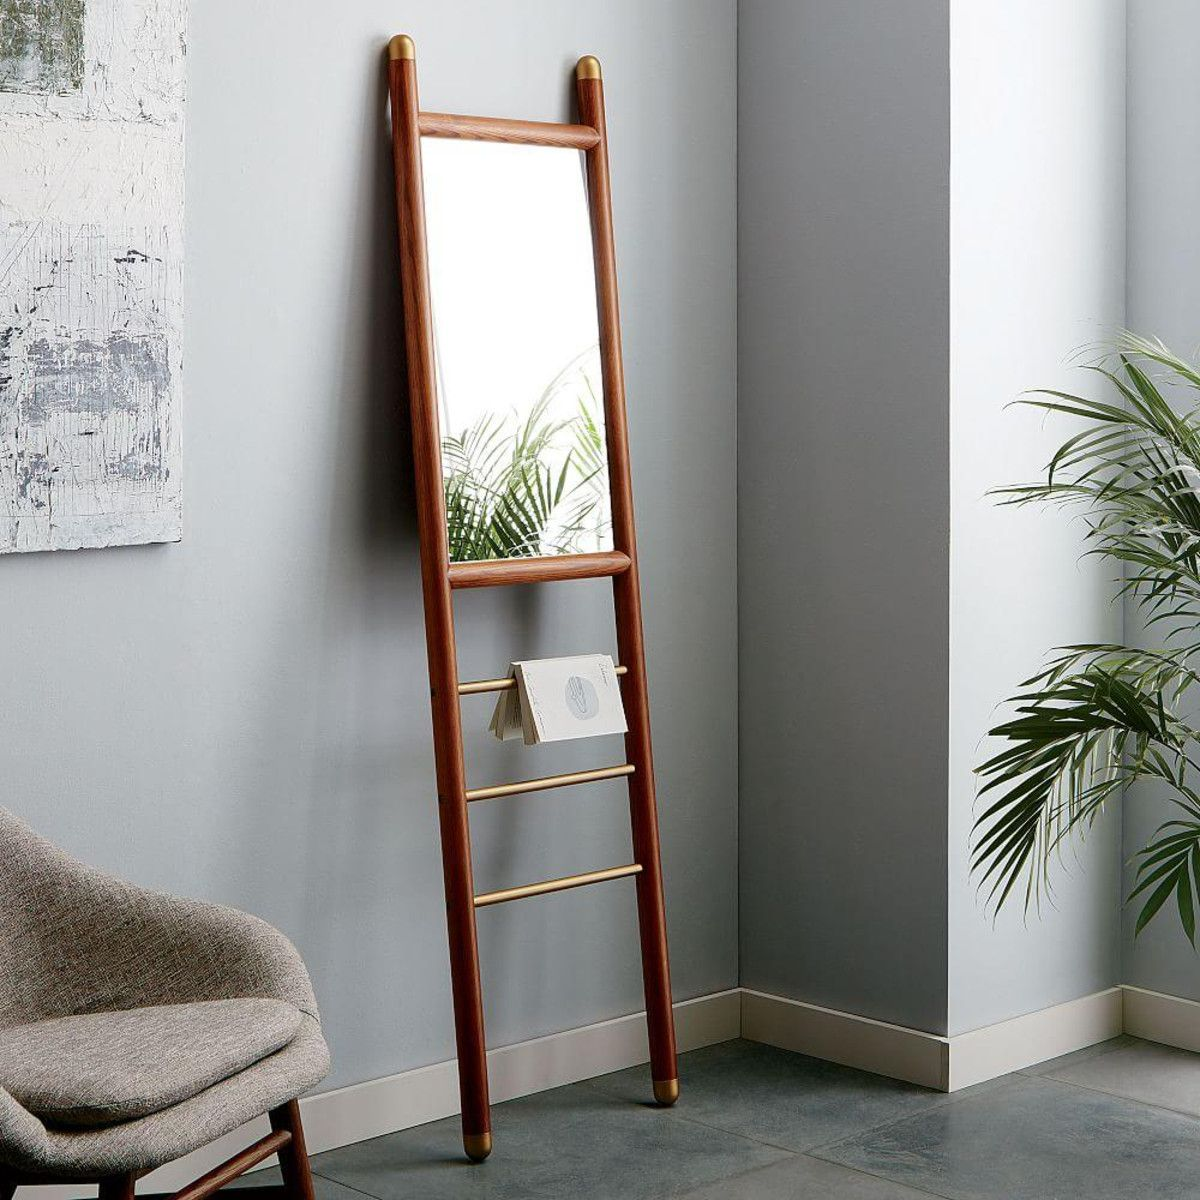 Mid-Century Dowel Mirror - Narrow | west elm UK | Mirror 镜子 ...